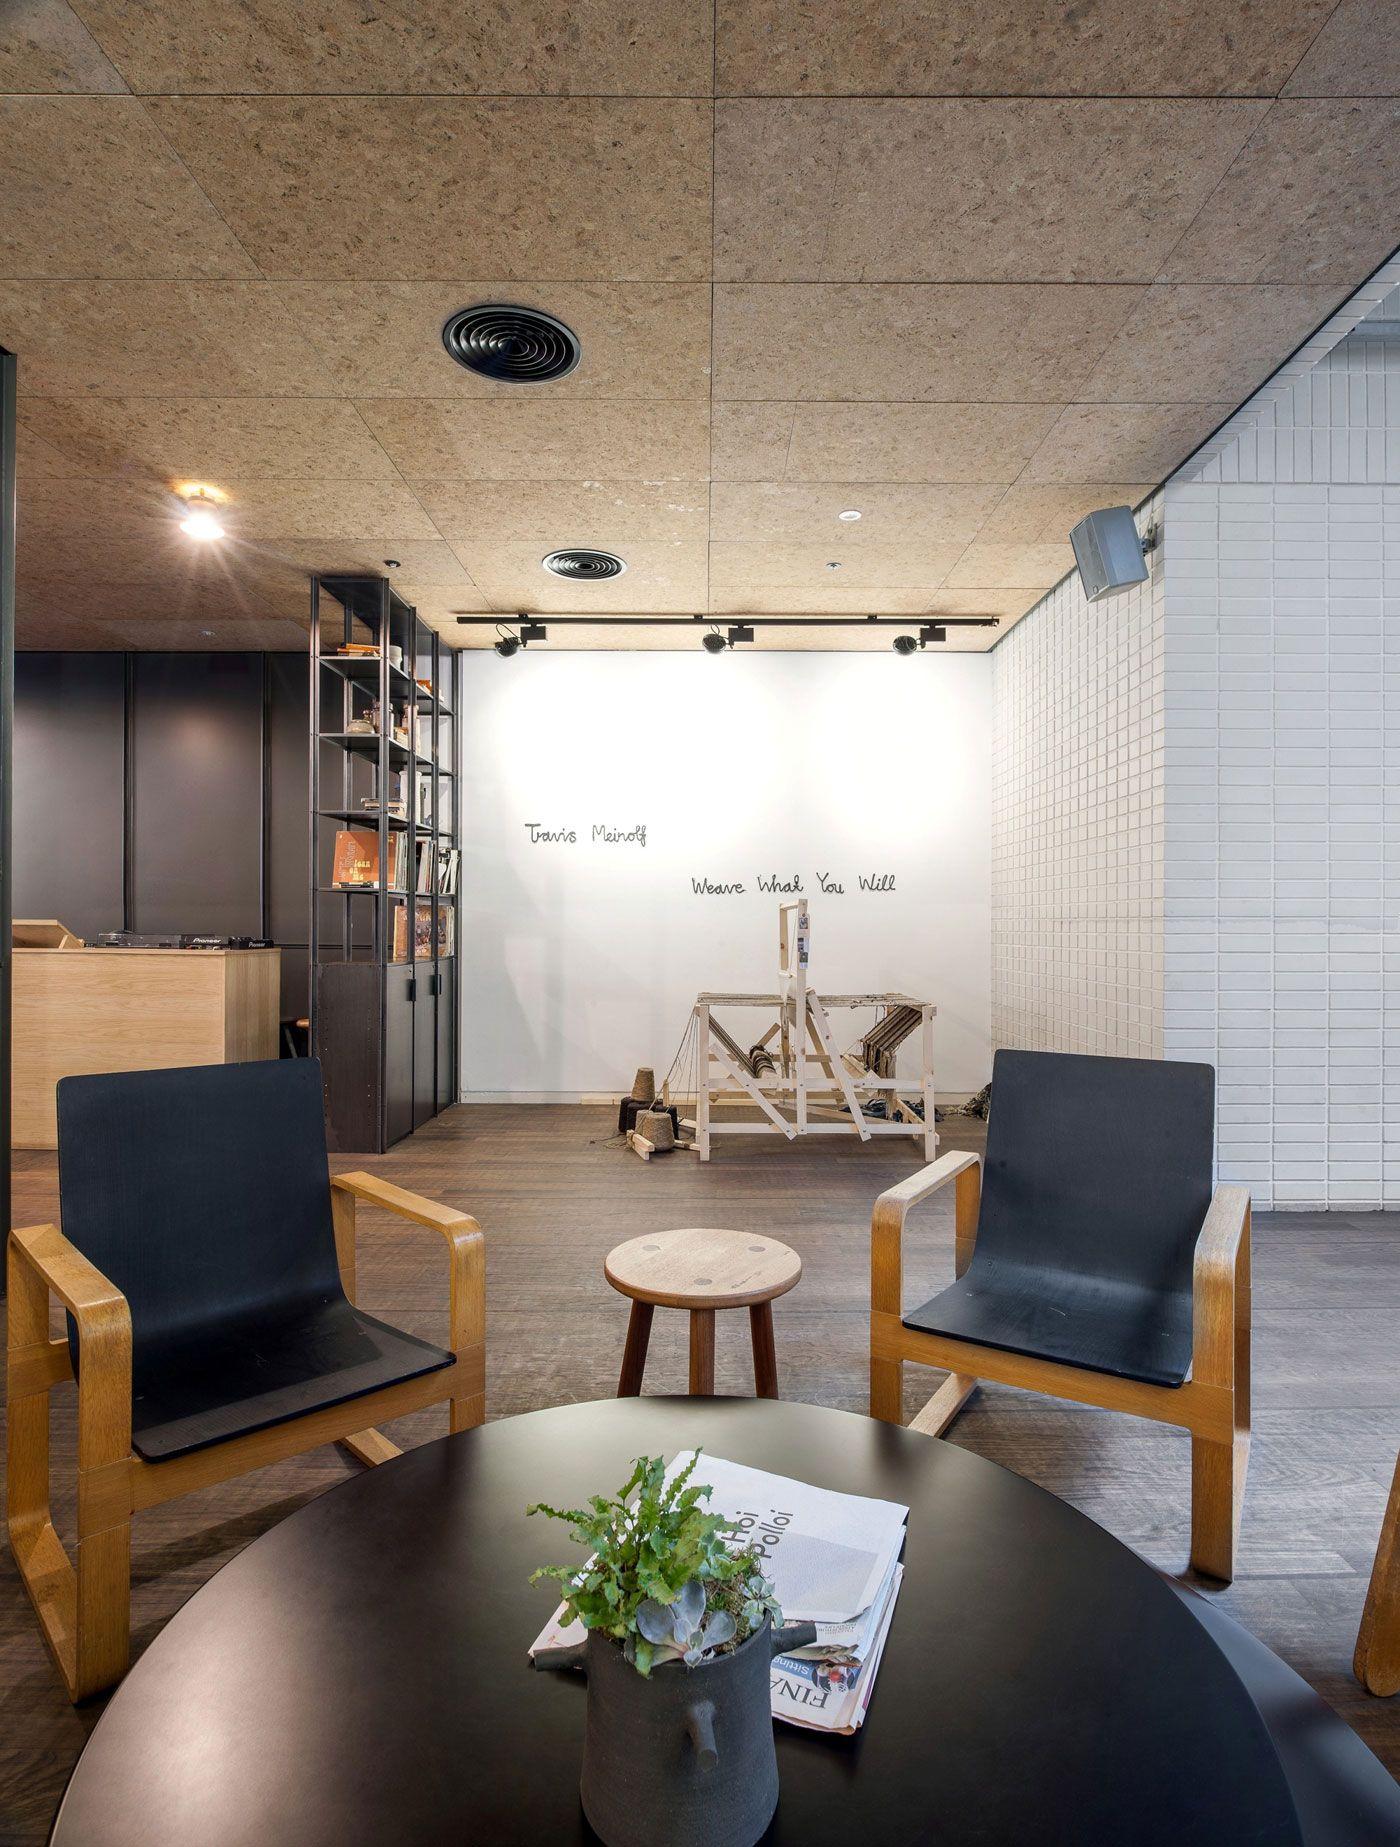 Ace Hotel London by Universal Design Studio 18 Interiors